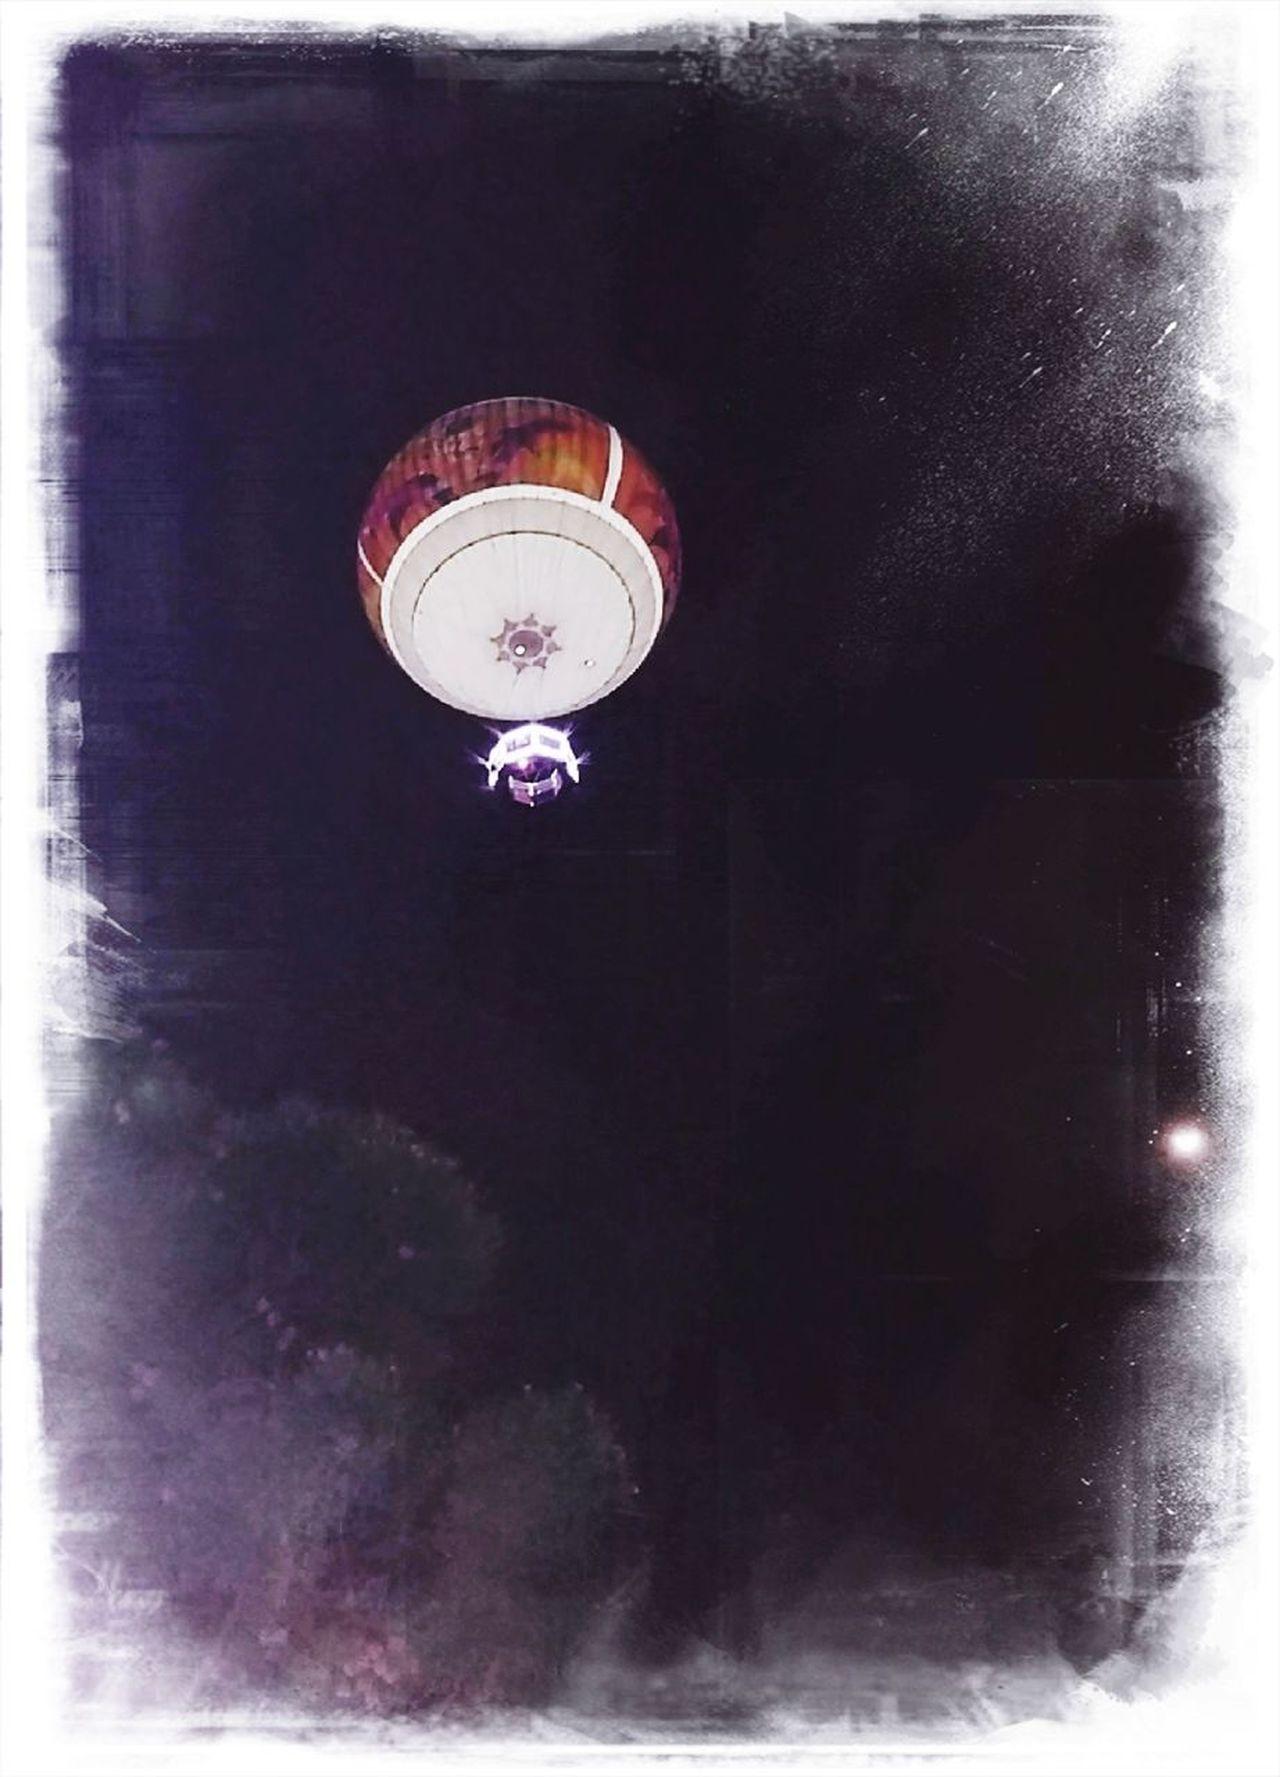 Hot Air Balloons Hot Air Balloon Festival Hot Air Balloons In The Sky communication No People Indoors  Close-up Day Baloons🎈 Baloon On Air Balooning Air Ballons EyeEm Best Shots EyeEm Nature Lover EyeEmNewHere EyeEm Gallery BYOPaper! The Great Outdoors - 2017 EyeEm Awards Putrajaya, Malaysia